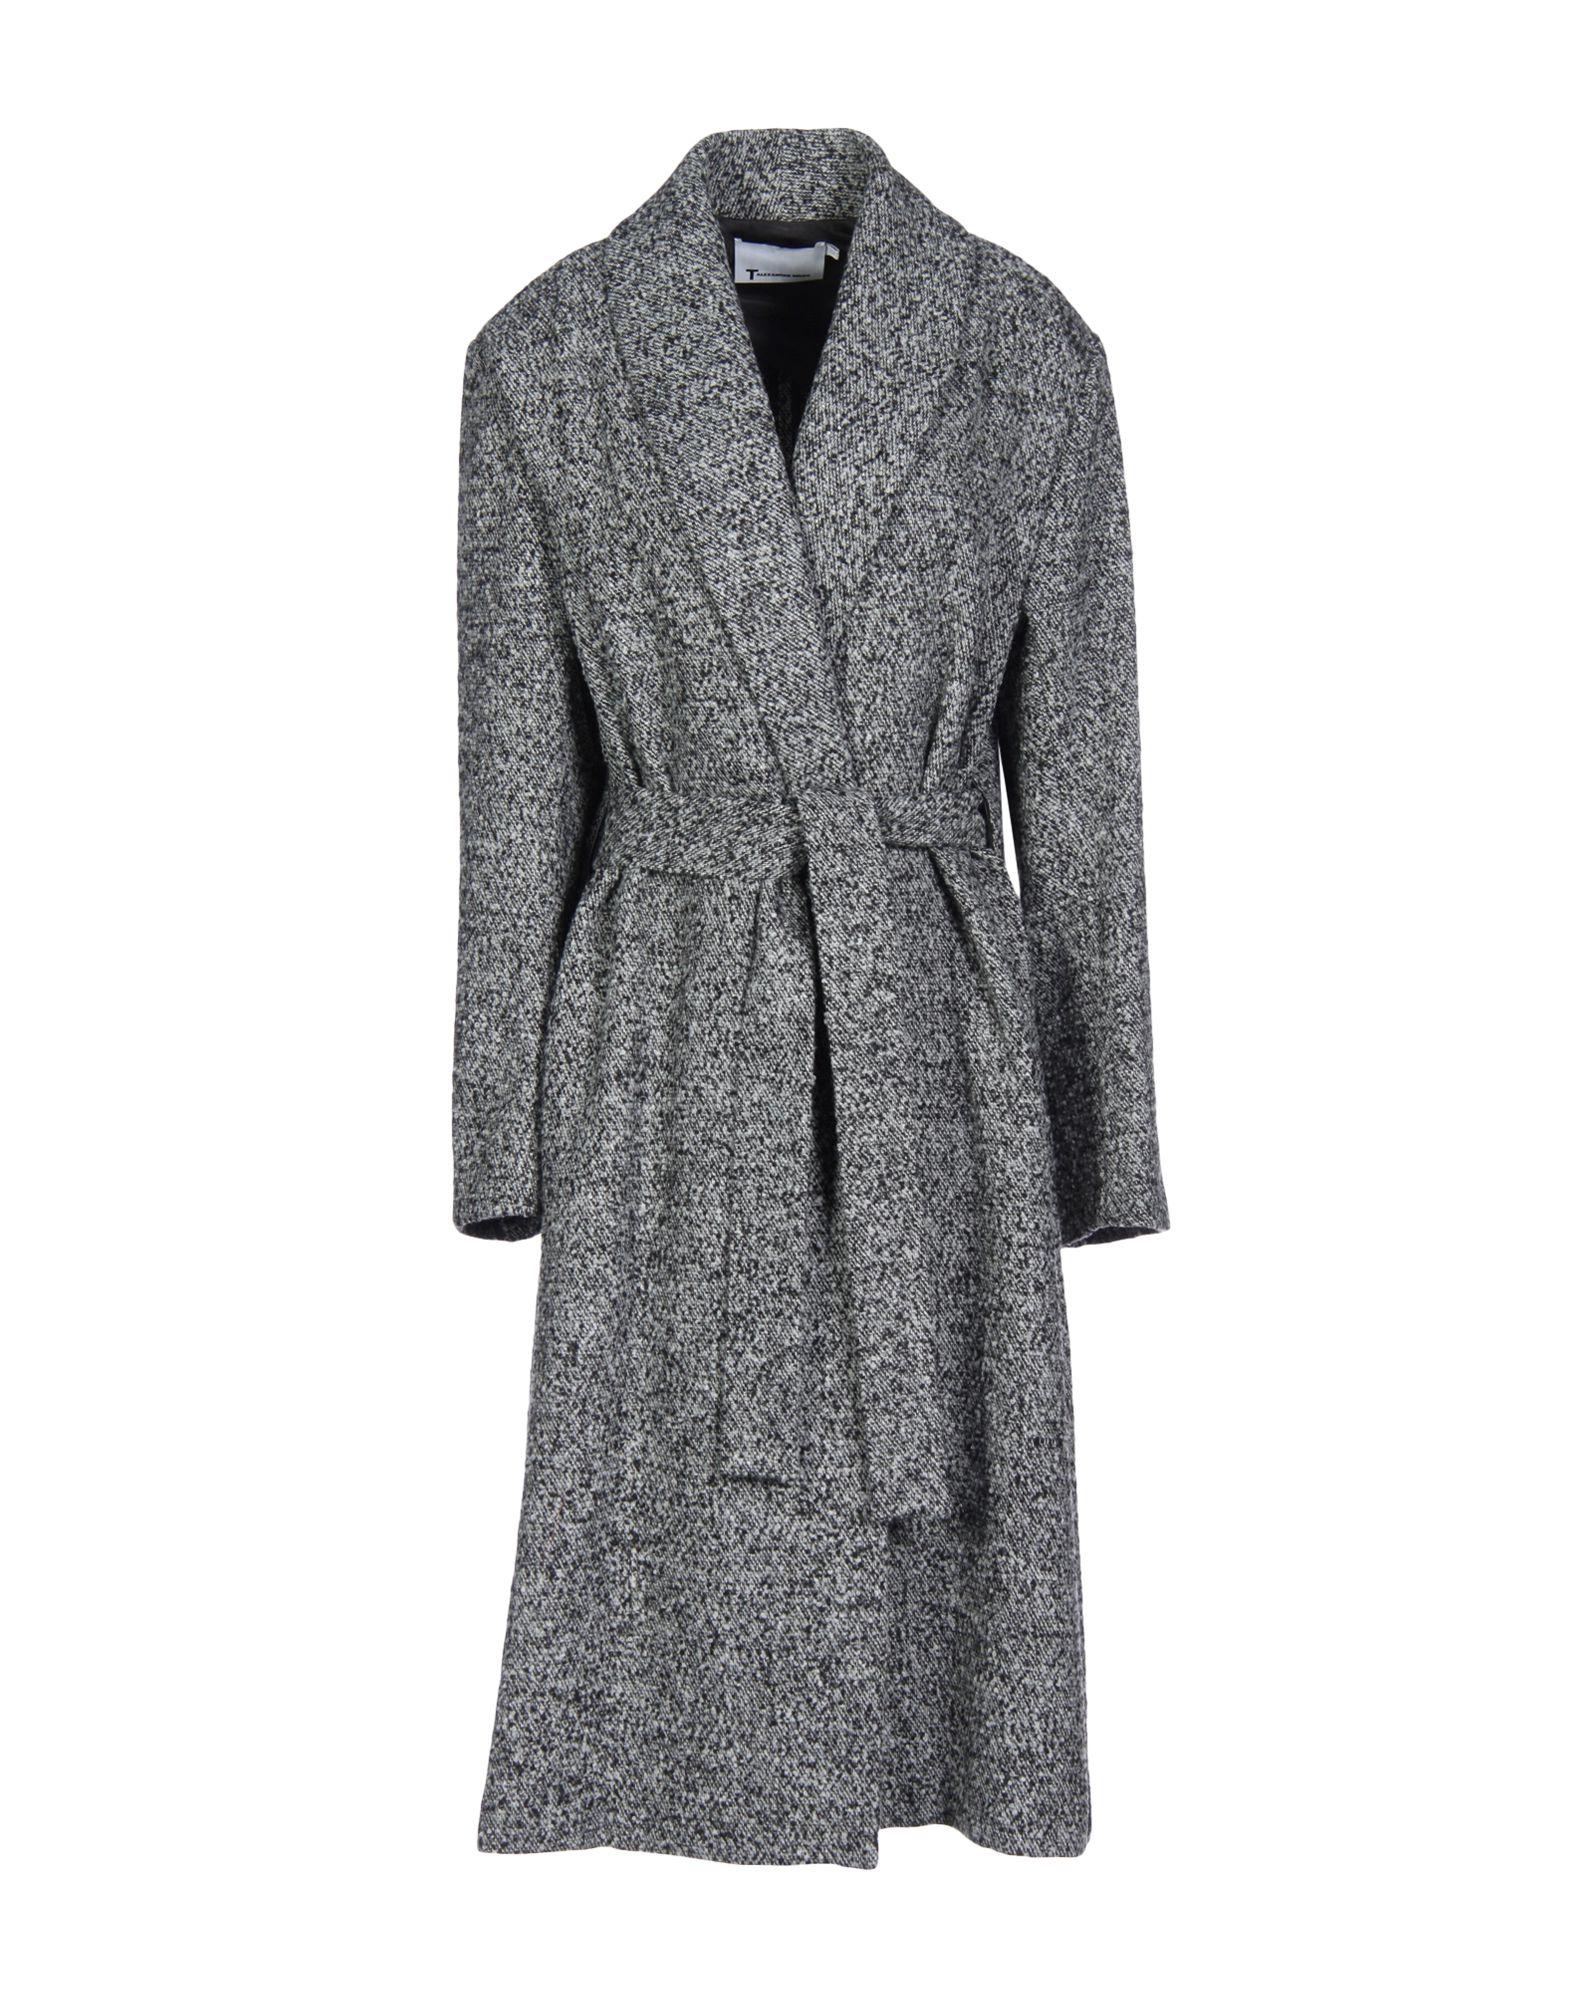 T by ALEXANDER WANG Пальто 57 t пальто